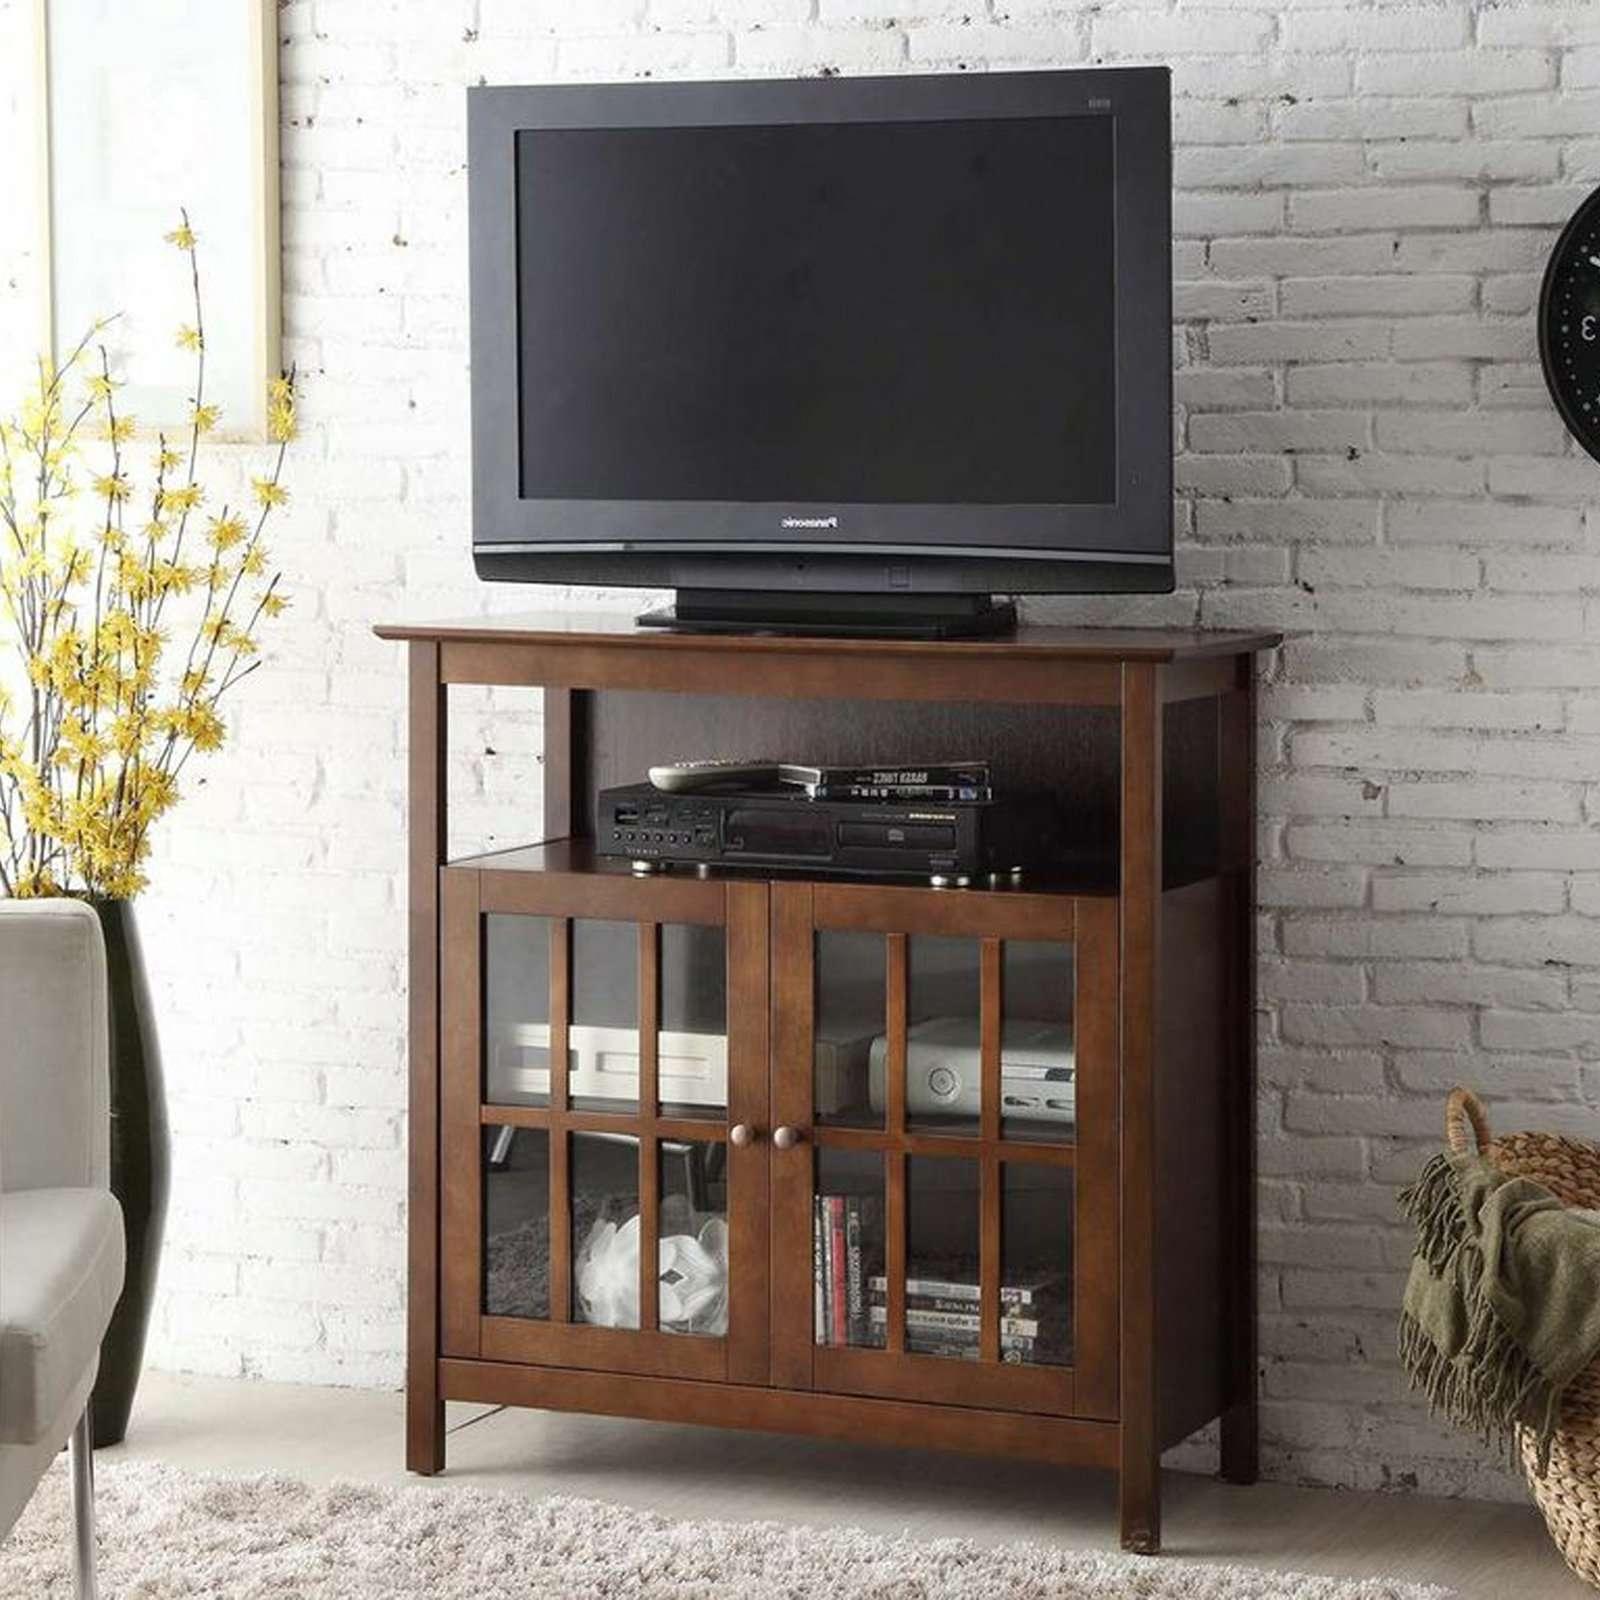 Bedroom Design: Inspiring Tv Stands For 40 Inch Flat Screen Tall Regarding 40 Inch Corner Tv Stands (View 5 of 15)